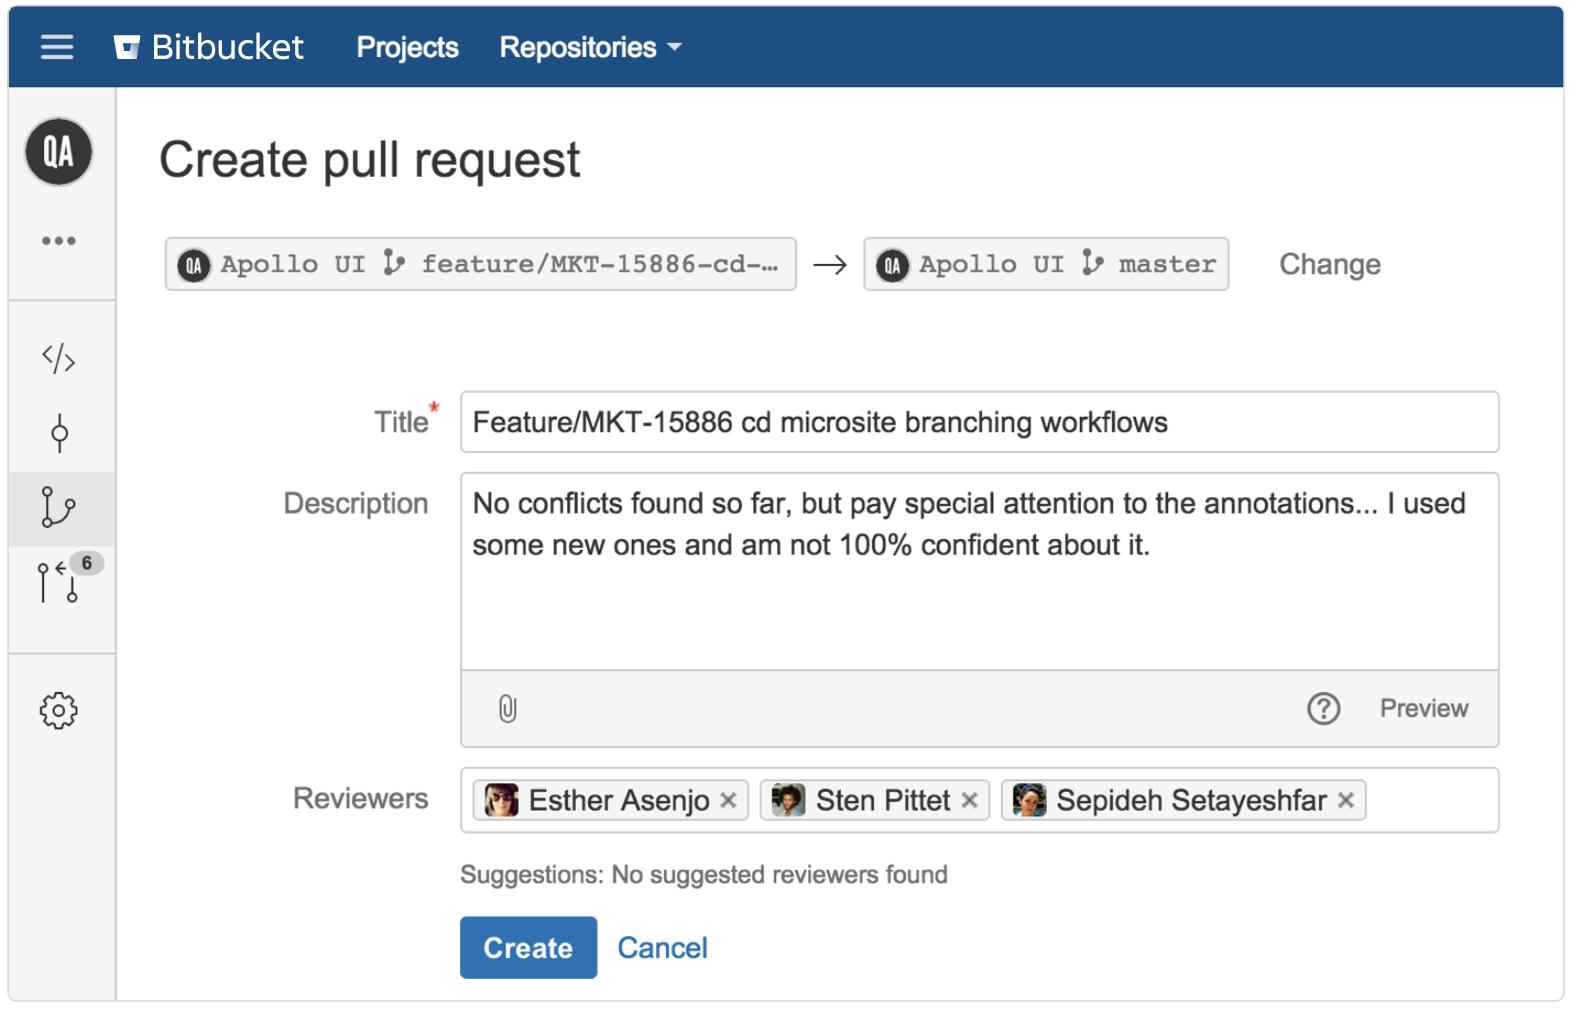 Bitbucket workflows pull request screenshot